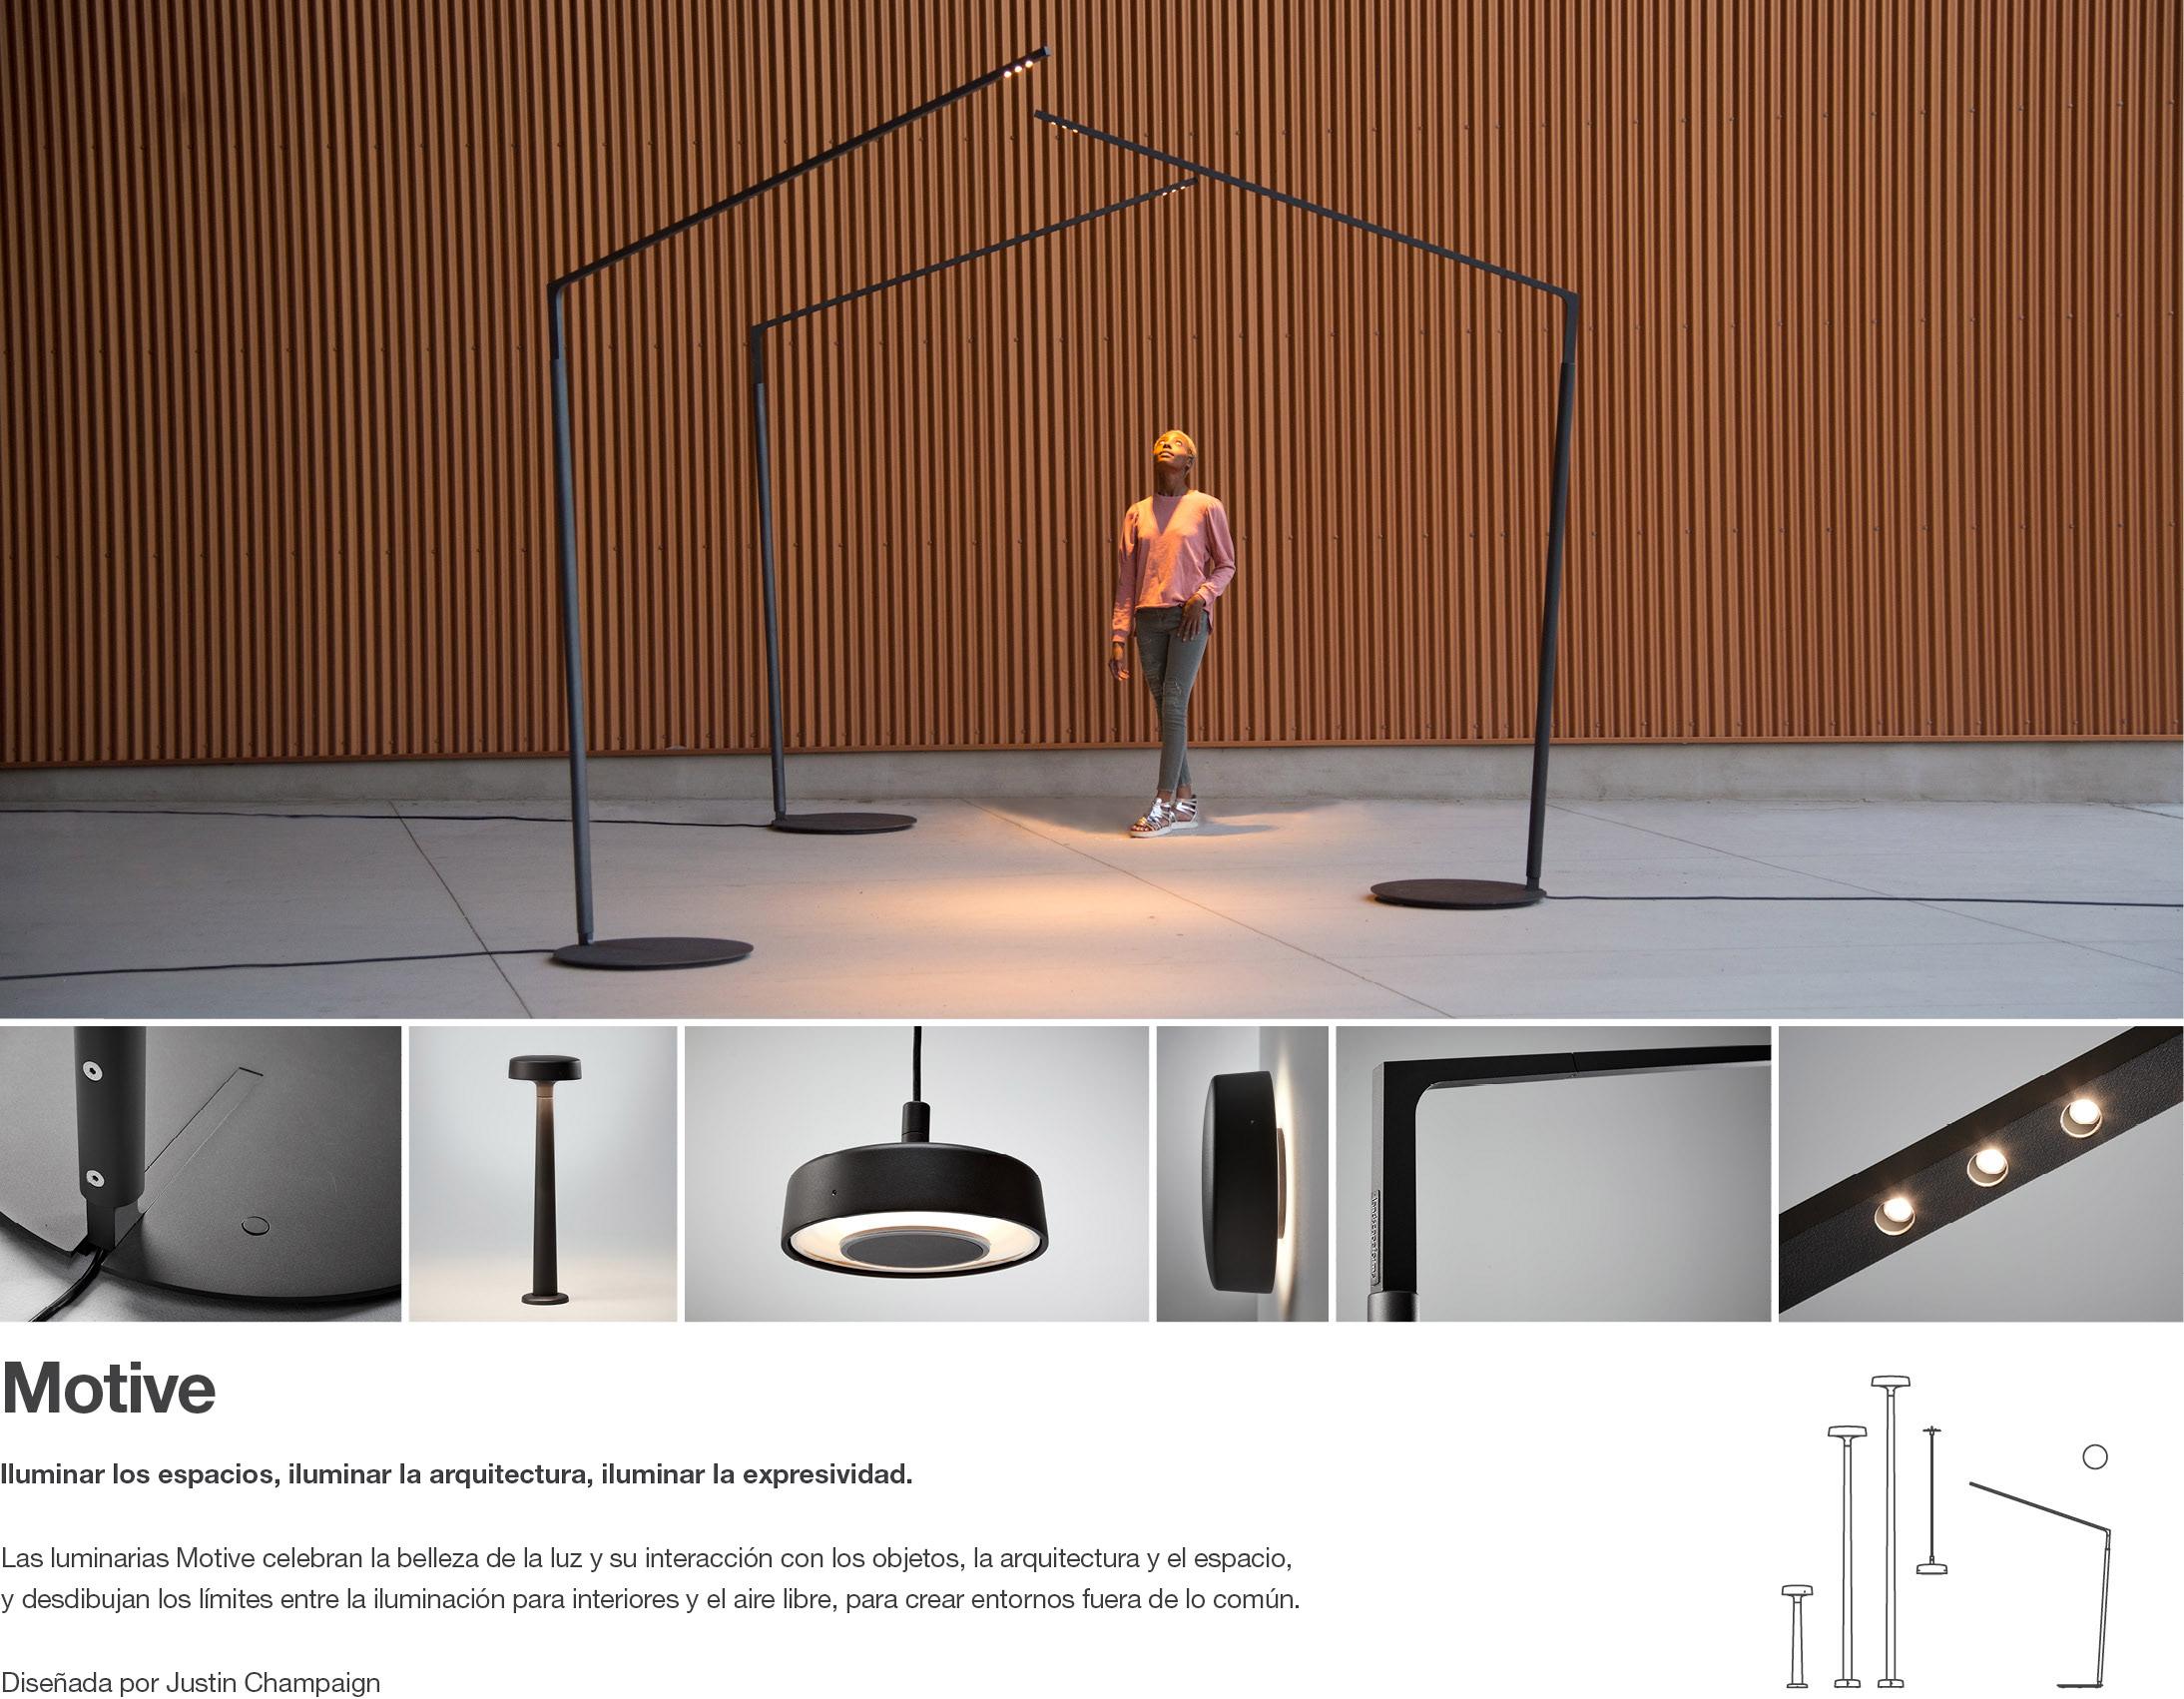 Motive - Iluminaciónpara el aire libre